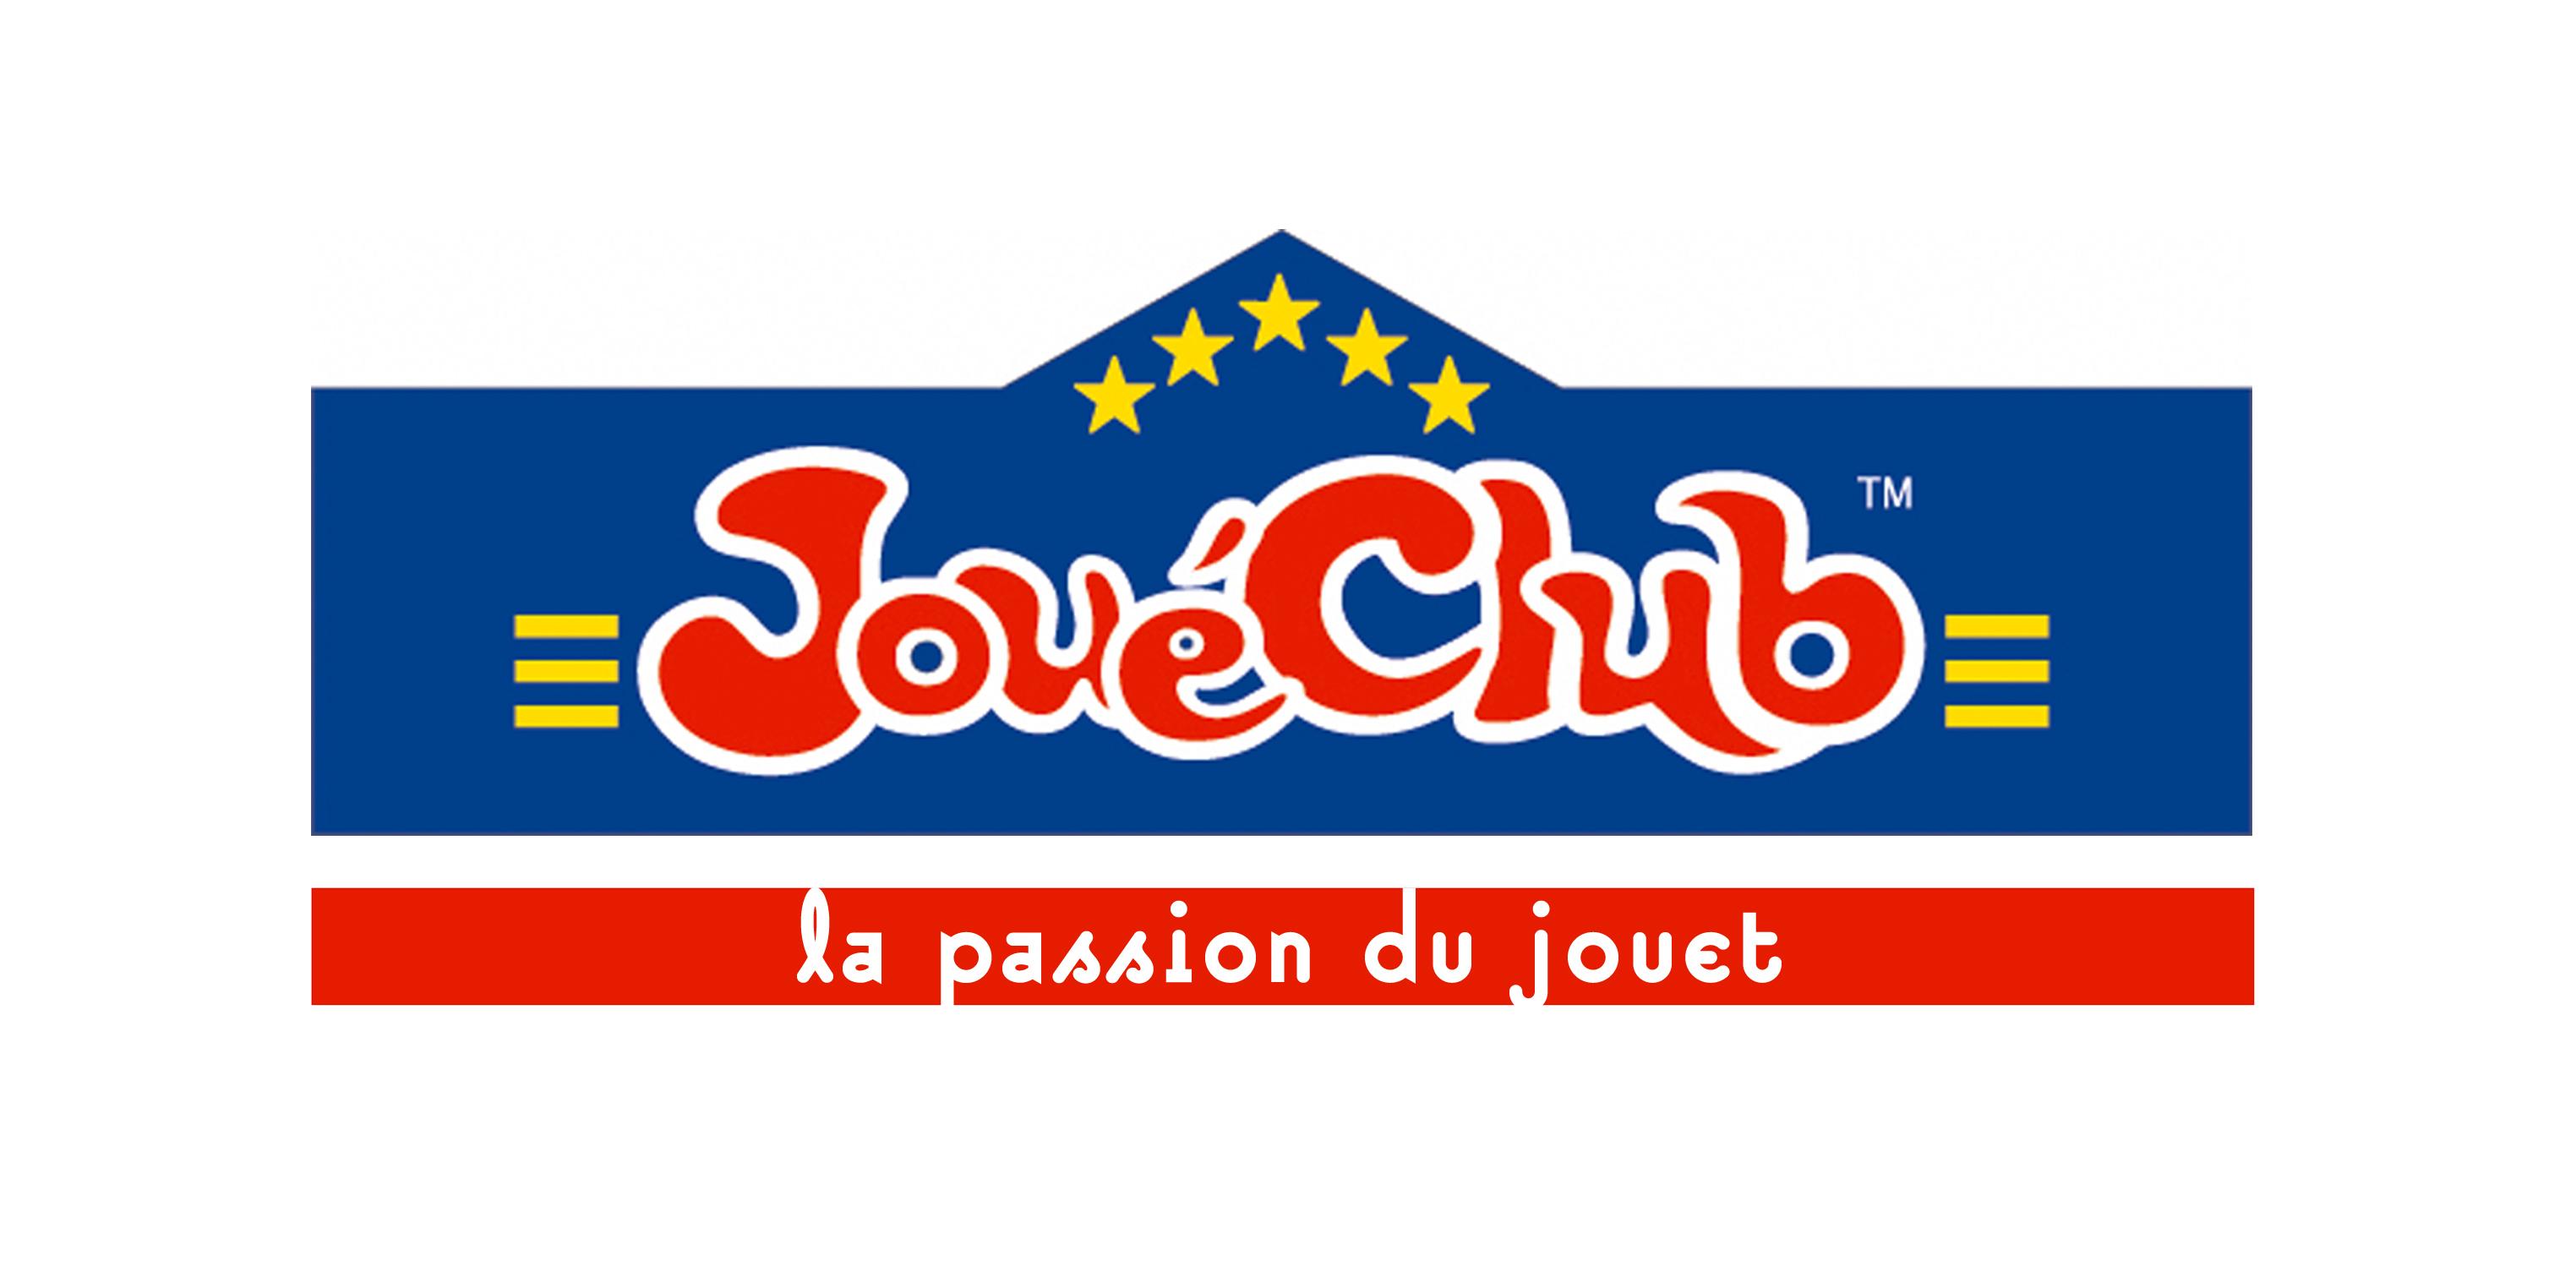 jou2 club